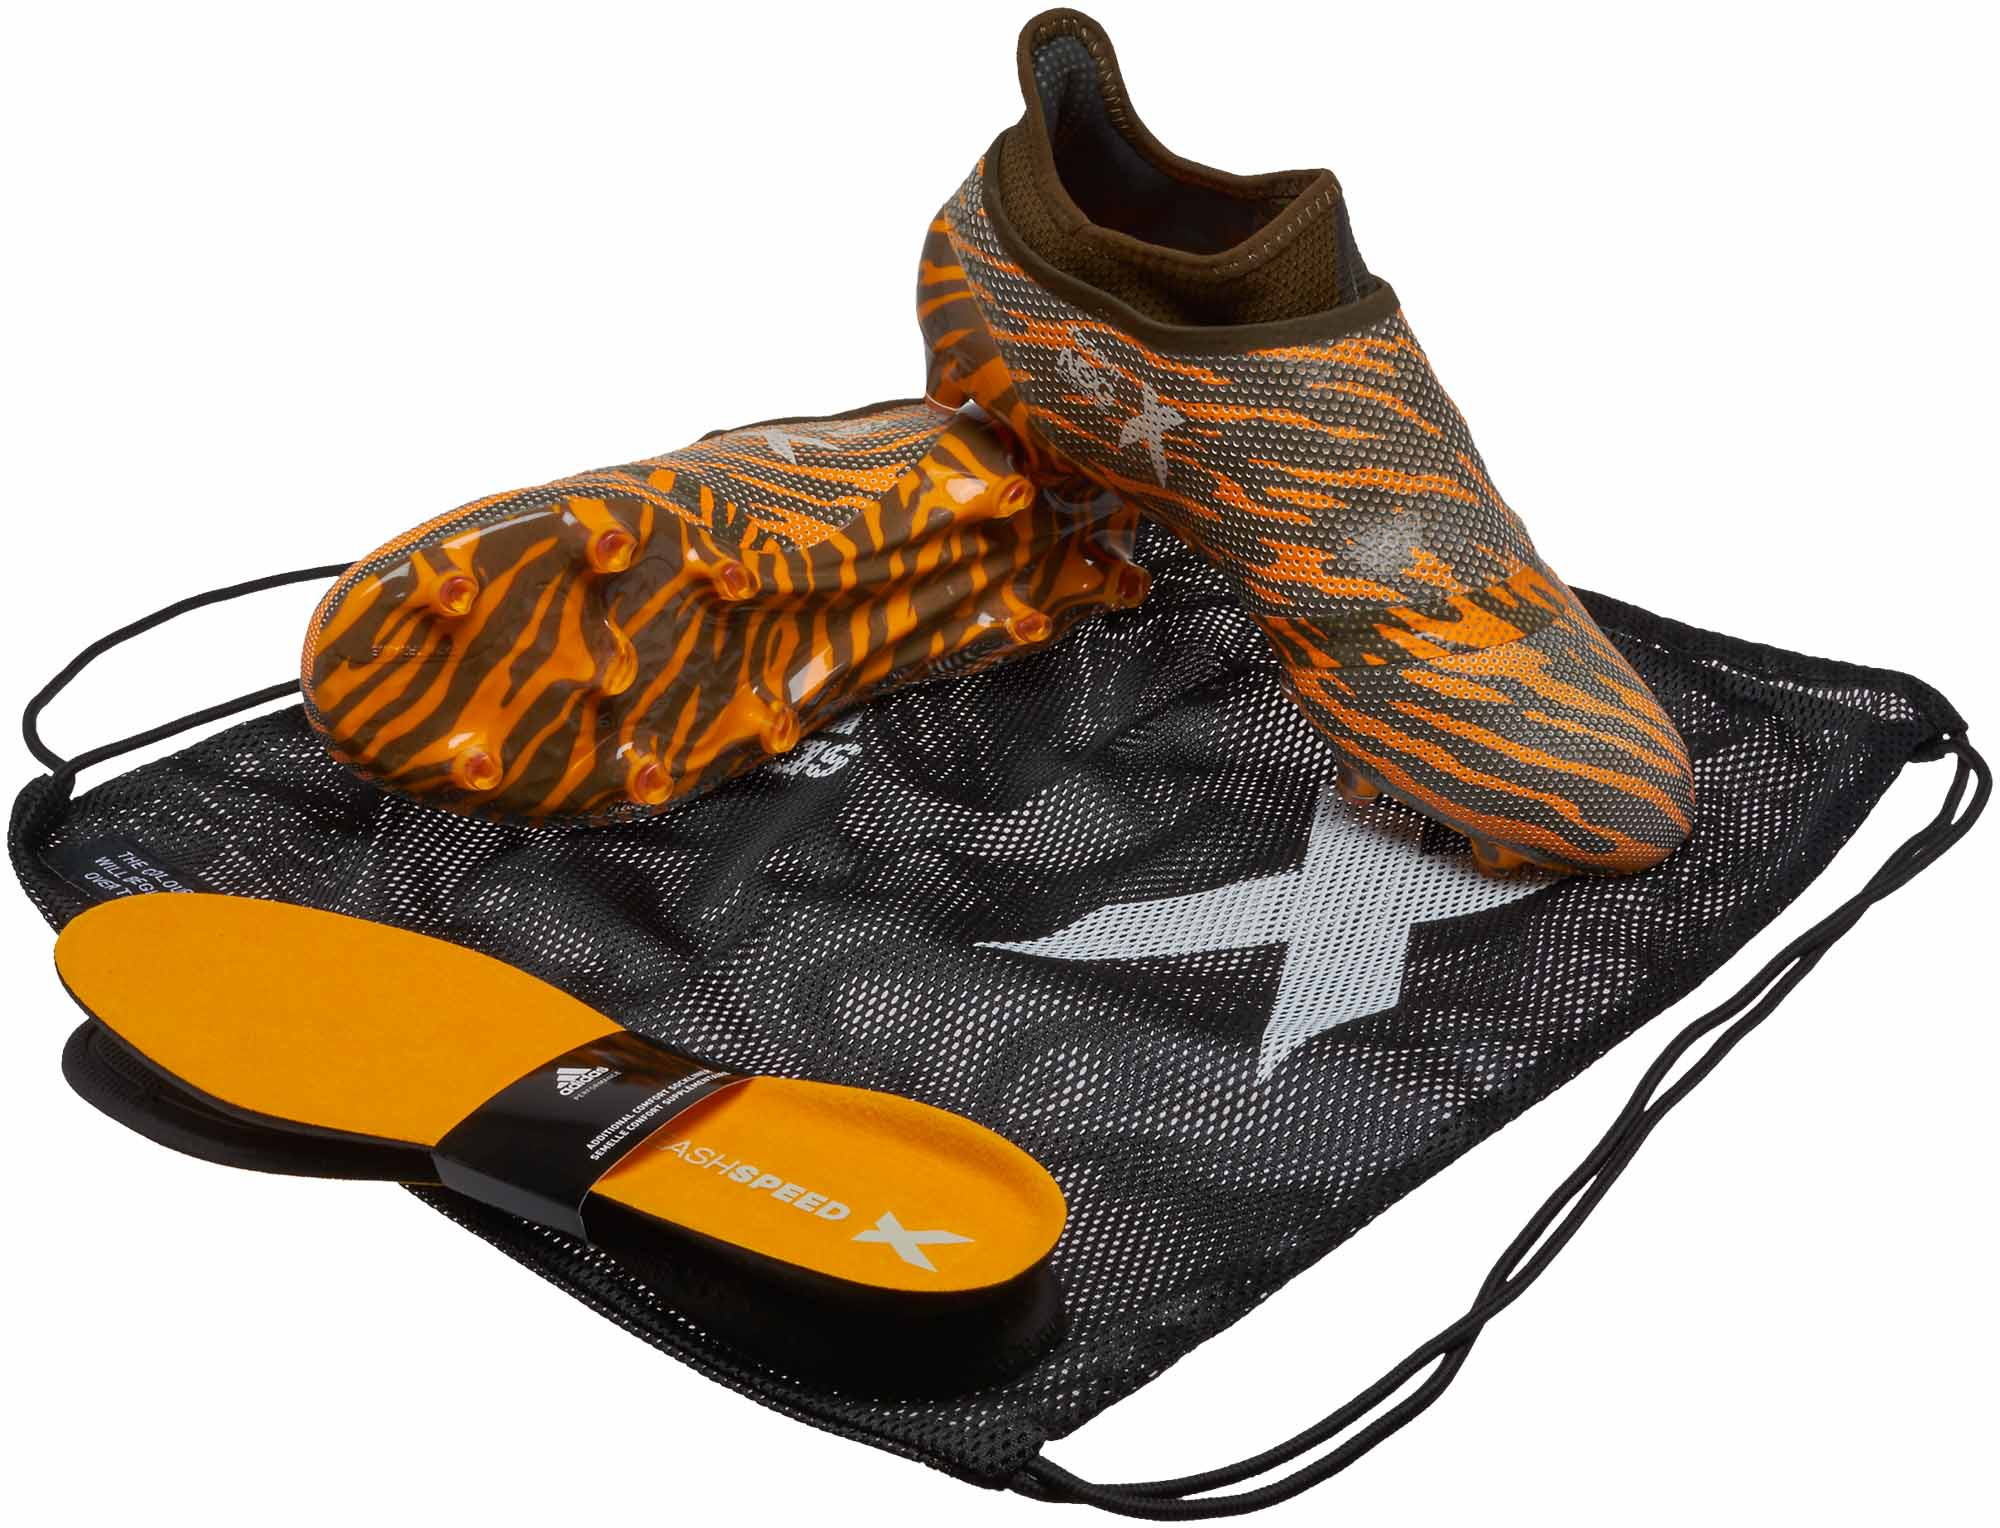 sports shoes 0ced4 4dd53 adidas X 17 FG – Burnt Orange Trace Olive